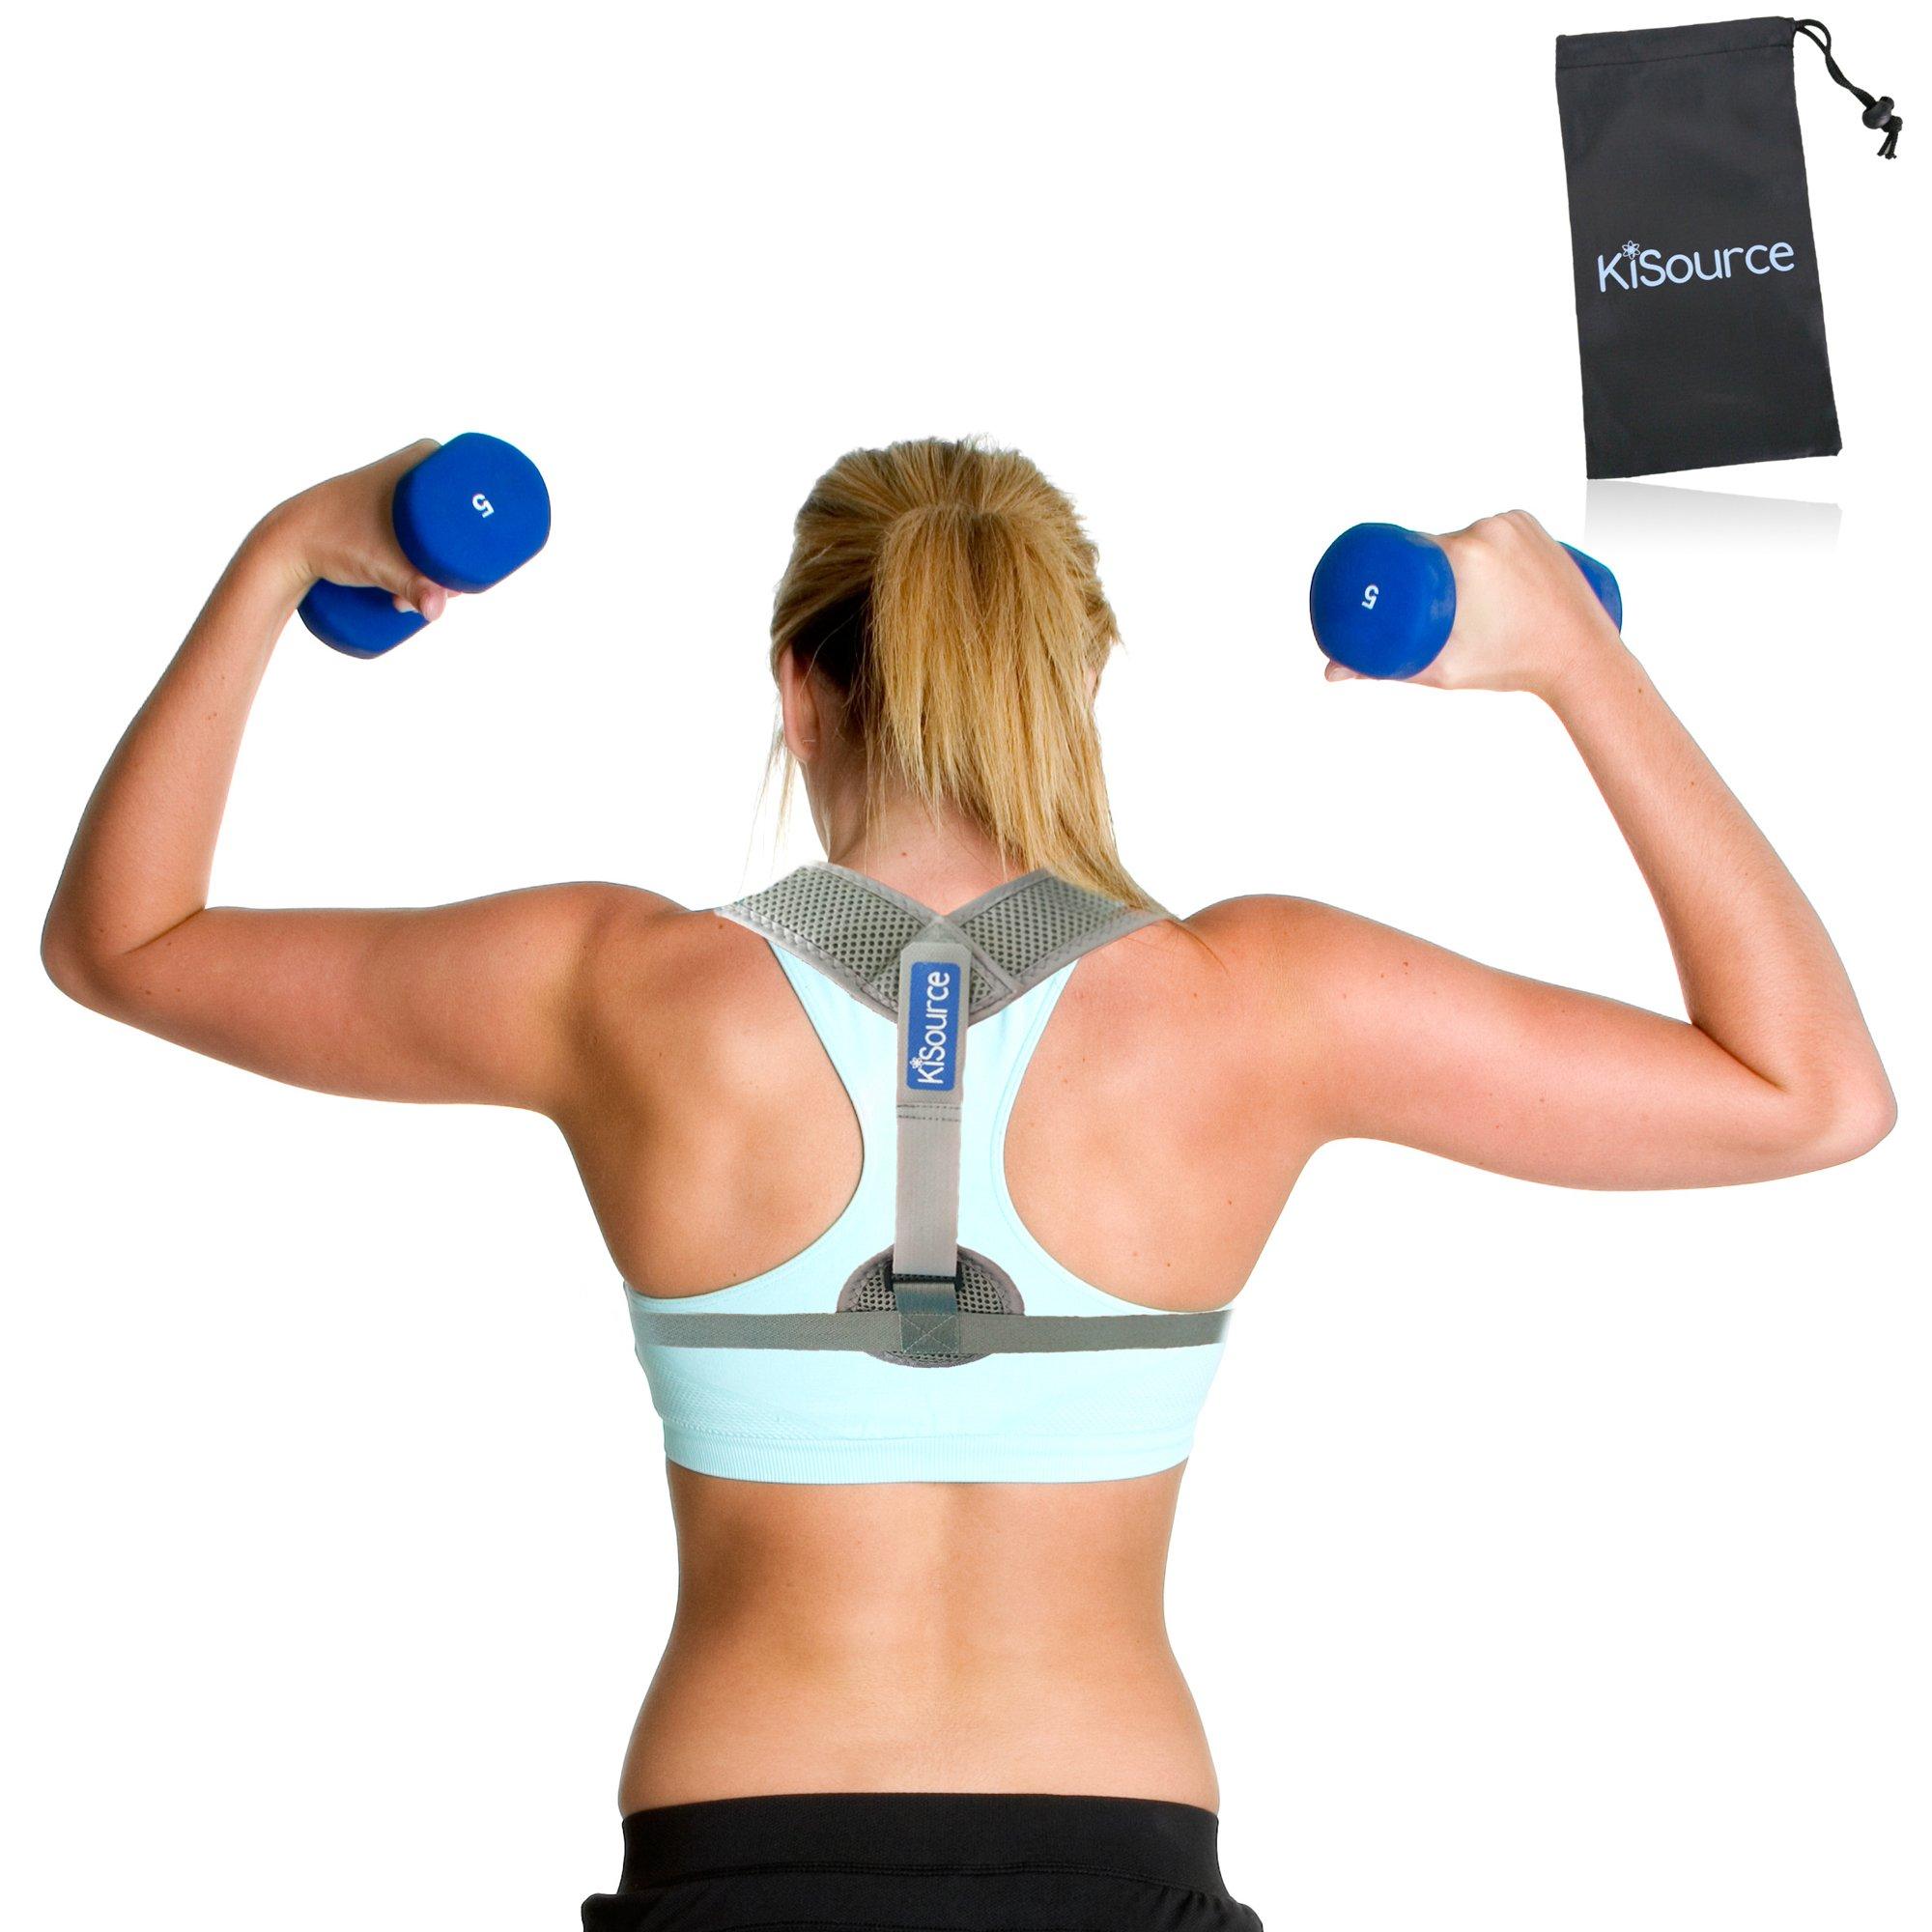 Back Posture Corrector & Shoulder Support for Men & Women | Comfortable & Discrete (Grey) Back Brace Provides Neck & Back Pain Relief | Improves & Straightens Posture